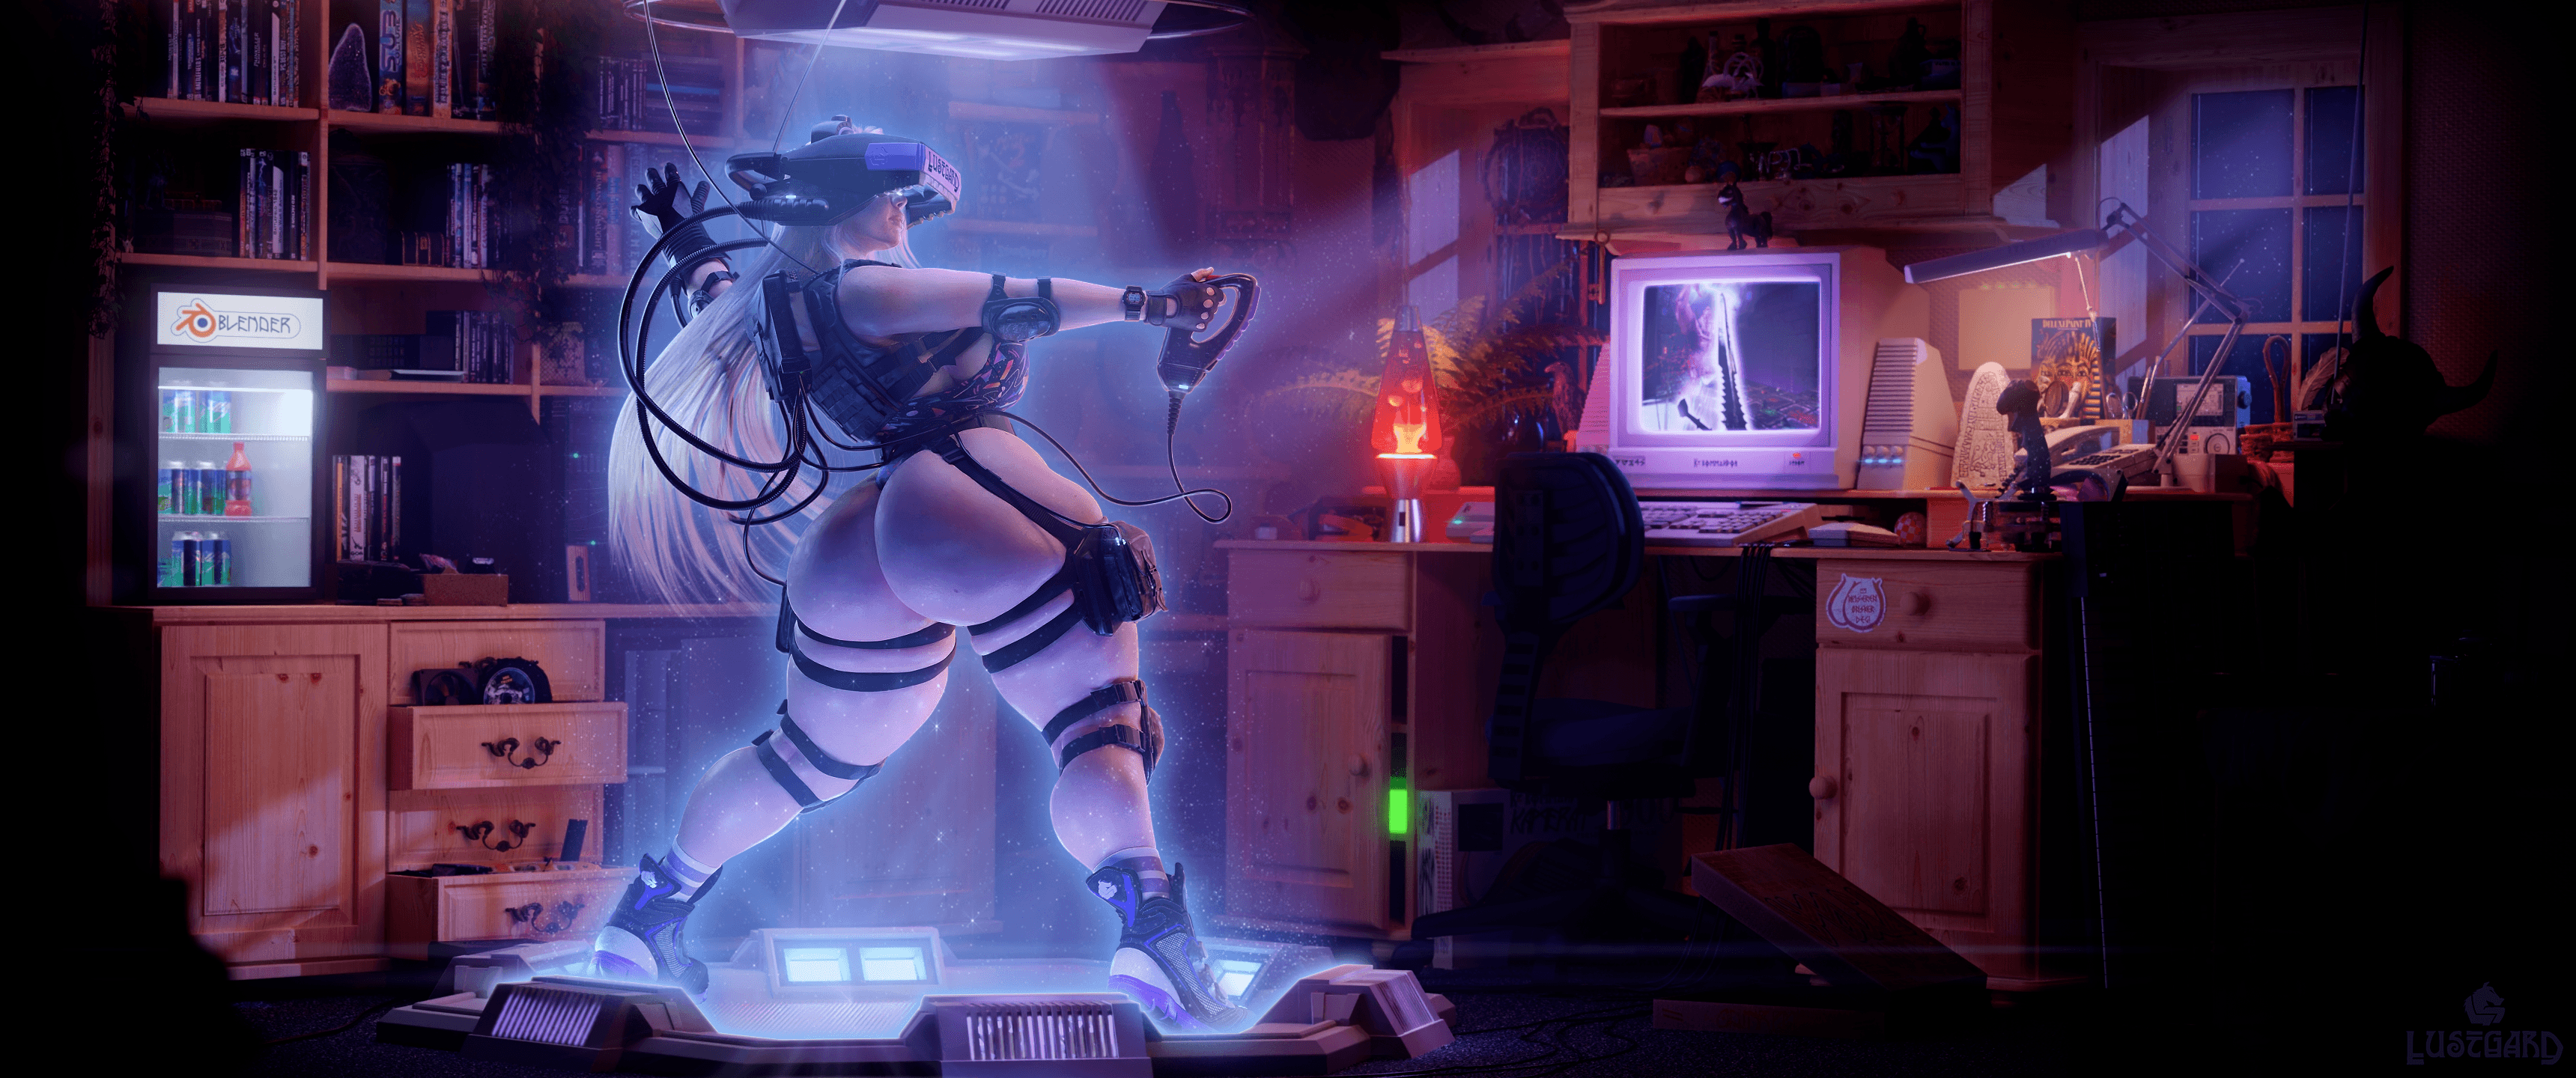 Lustgard-Virtuality.png